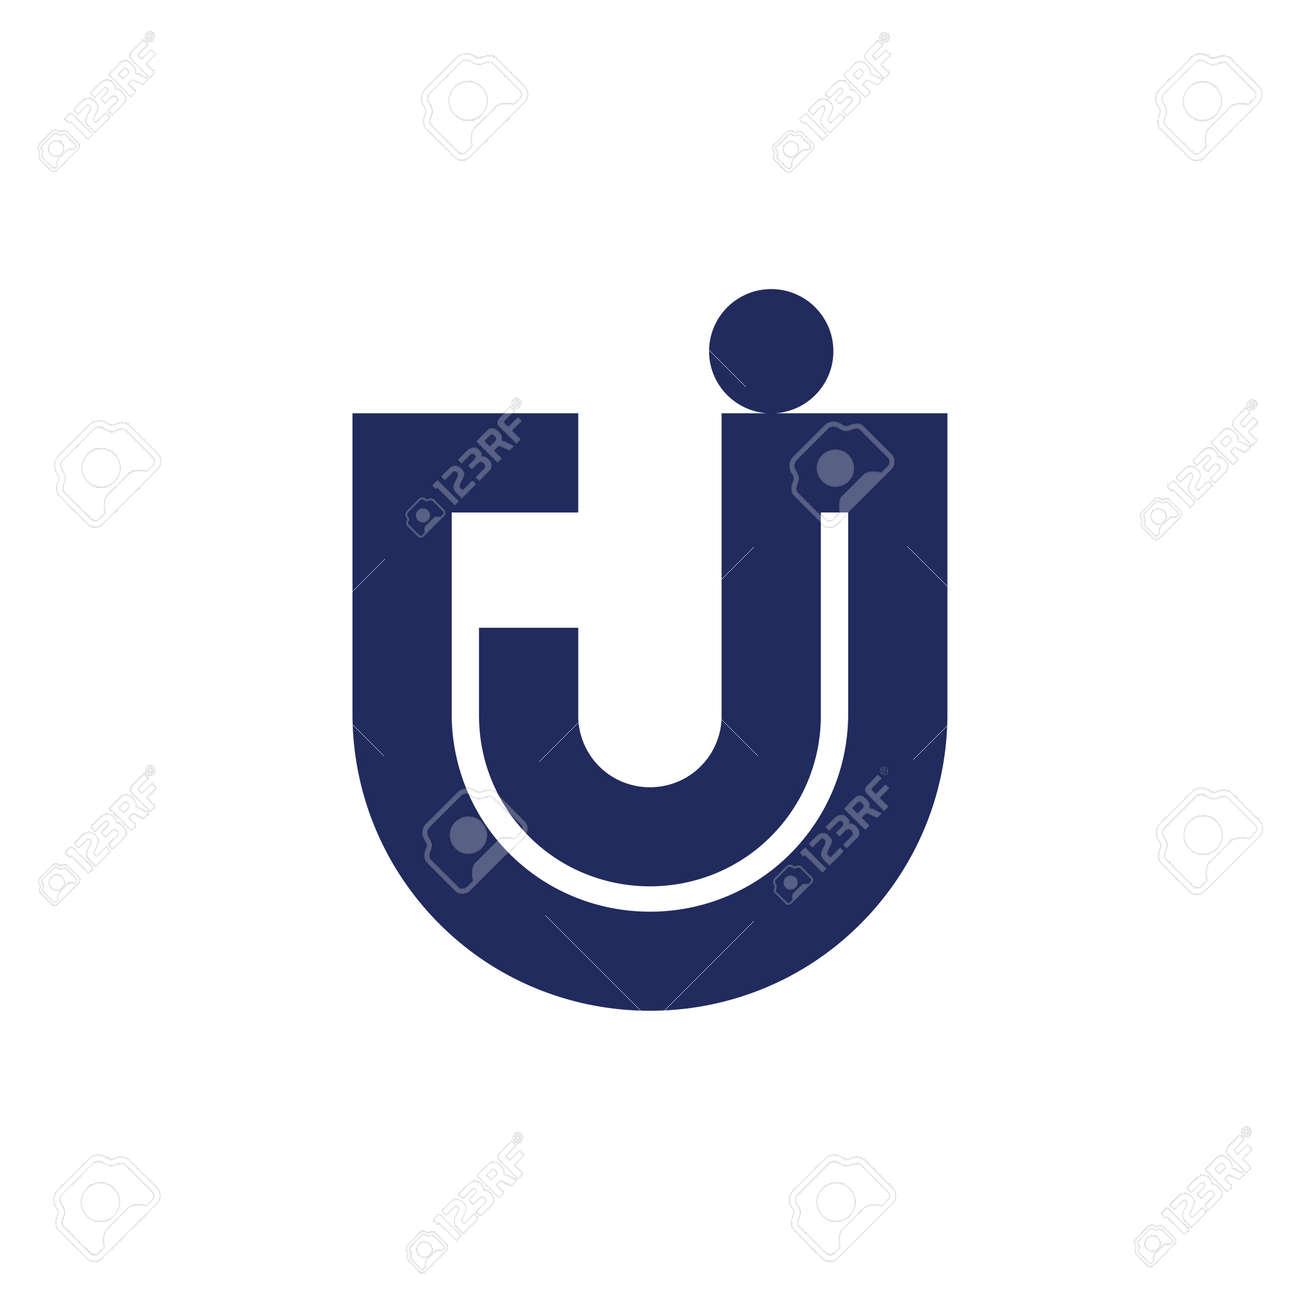 letter uj simple geometric line logo vector - 123147848